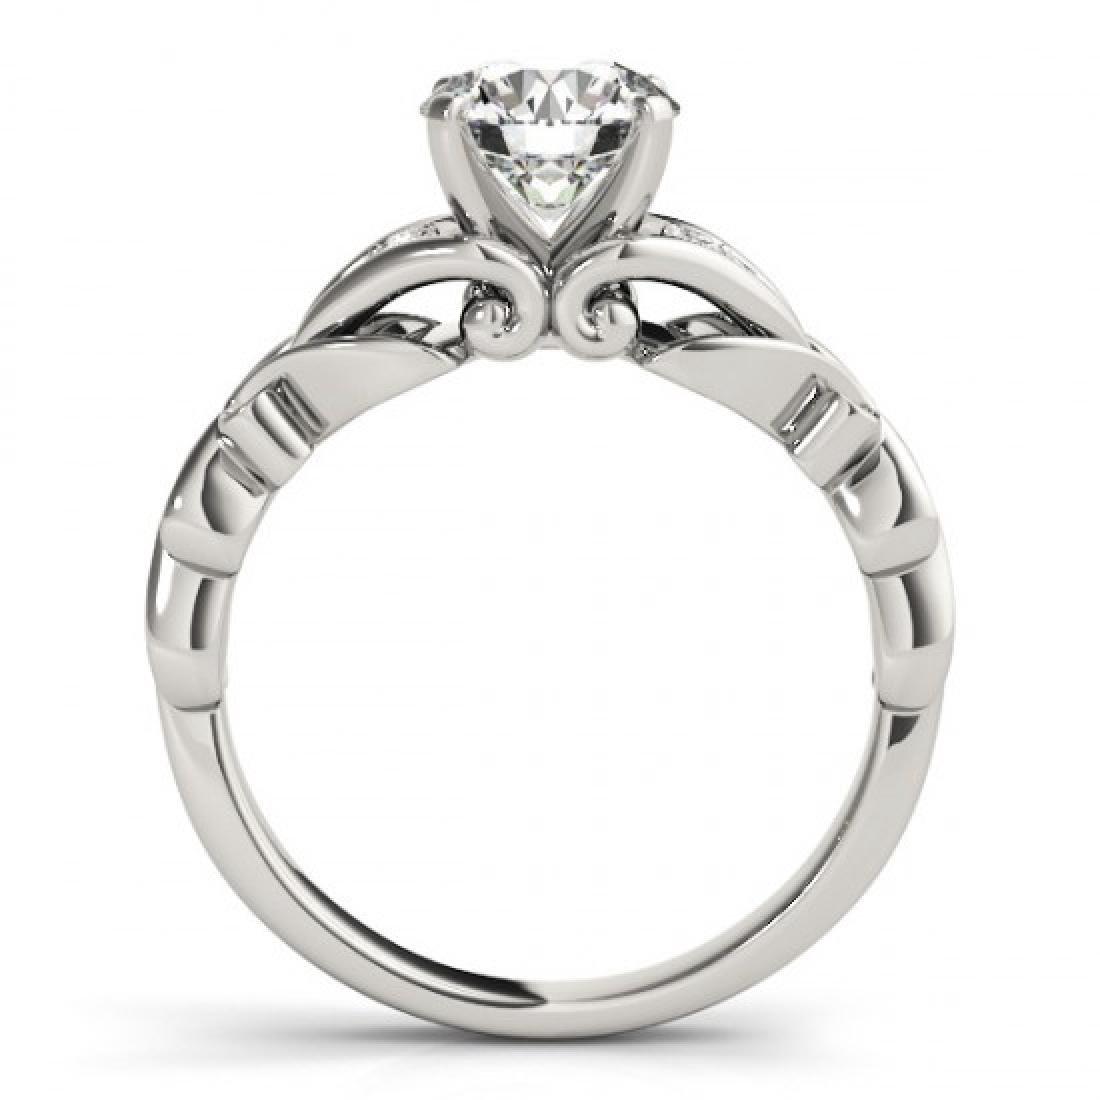 0.85 CTW VS/SI Diamond Solitaire Ring 18K White Gold - 2